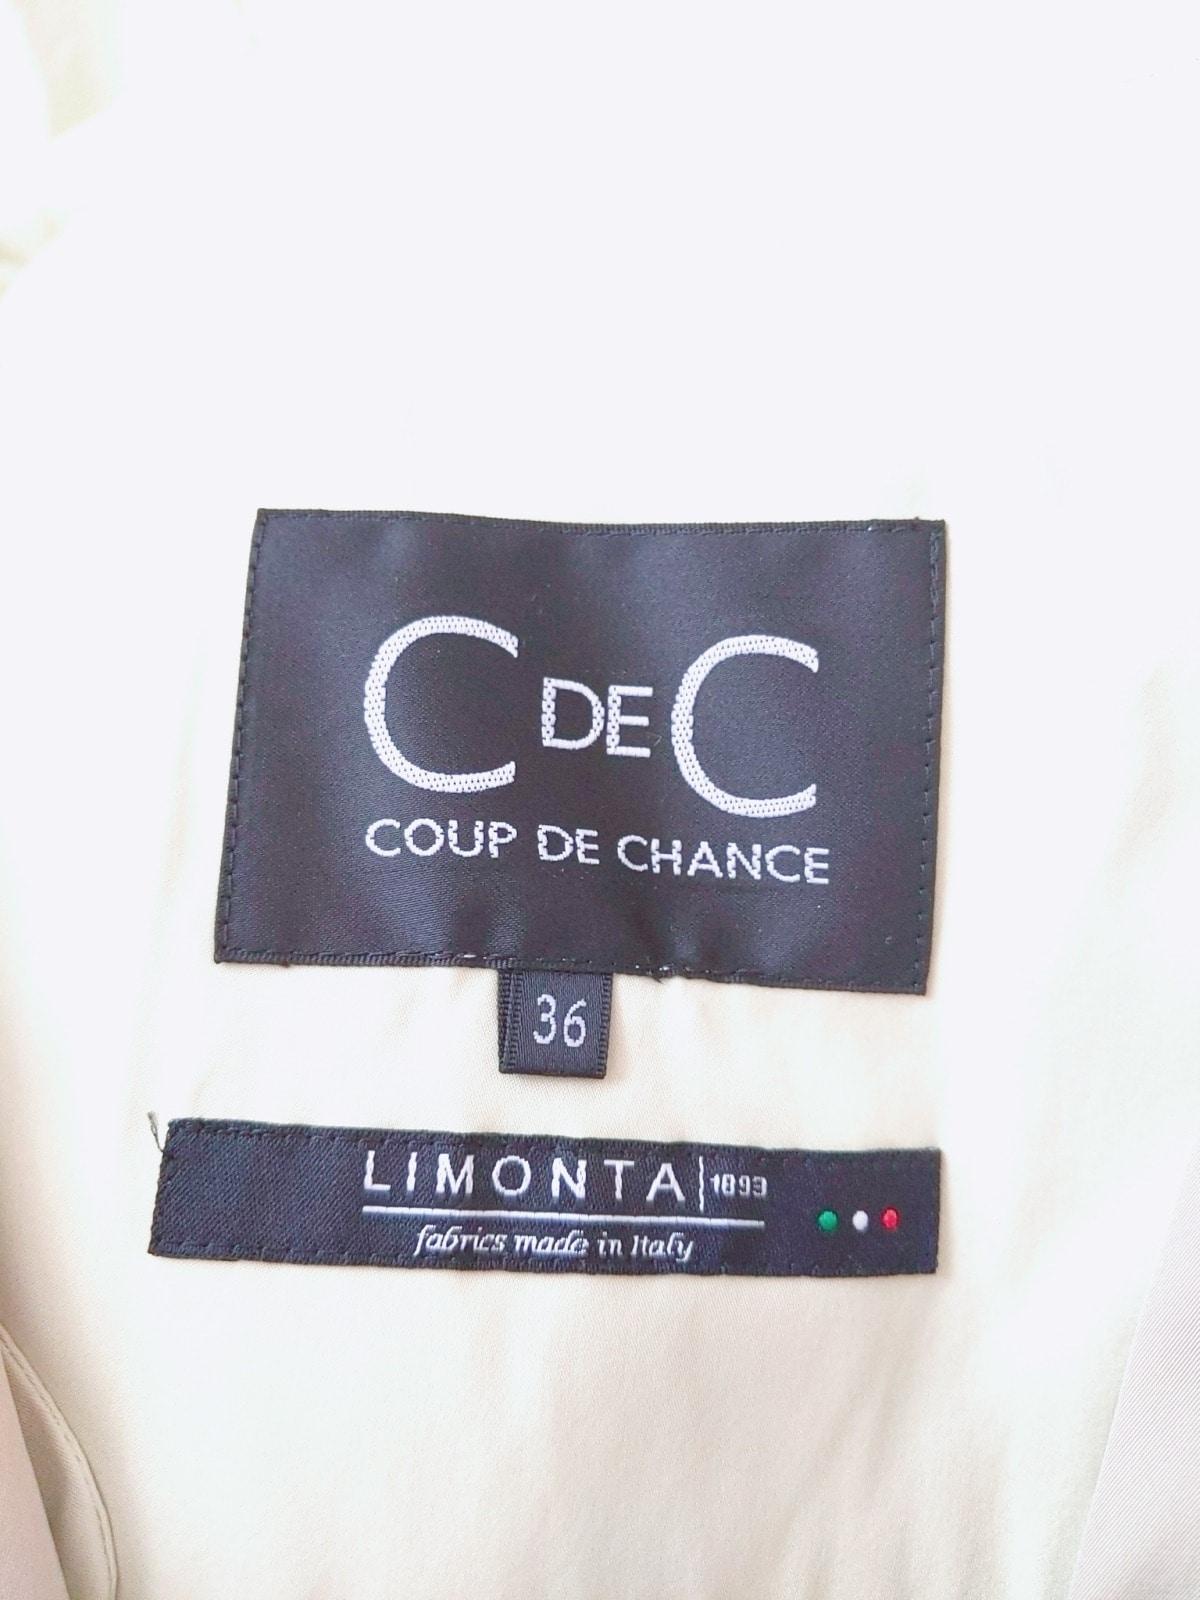 CdeC COUP DE CHANCE(クードシャンス)のコート